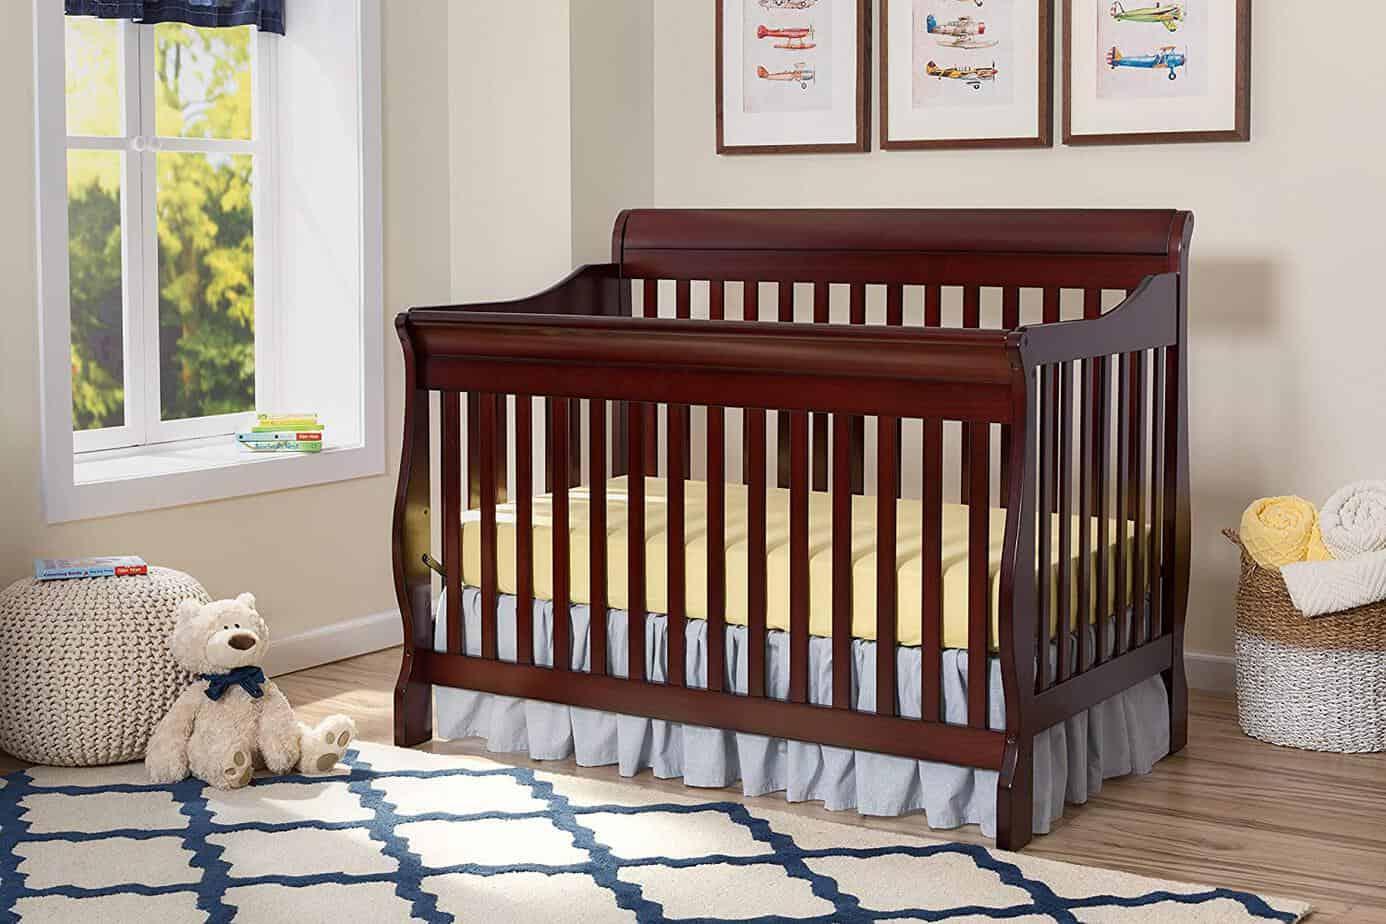 Delta Children Canton 4-In-1 Convertible Crib